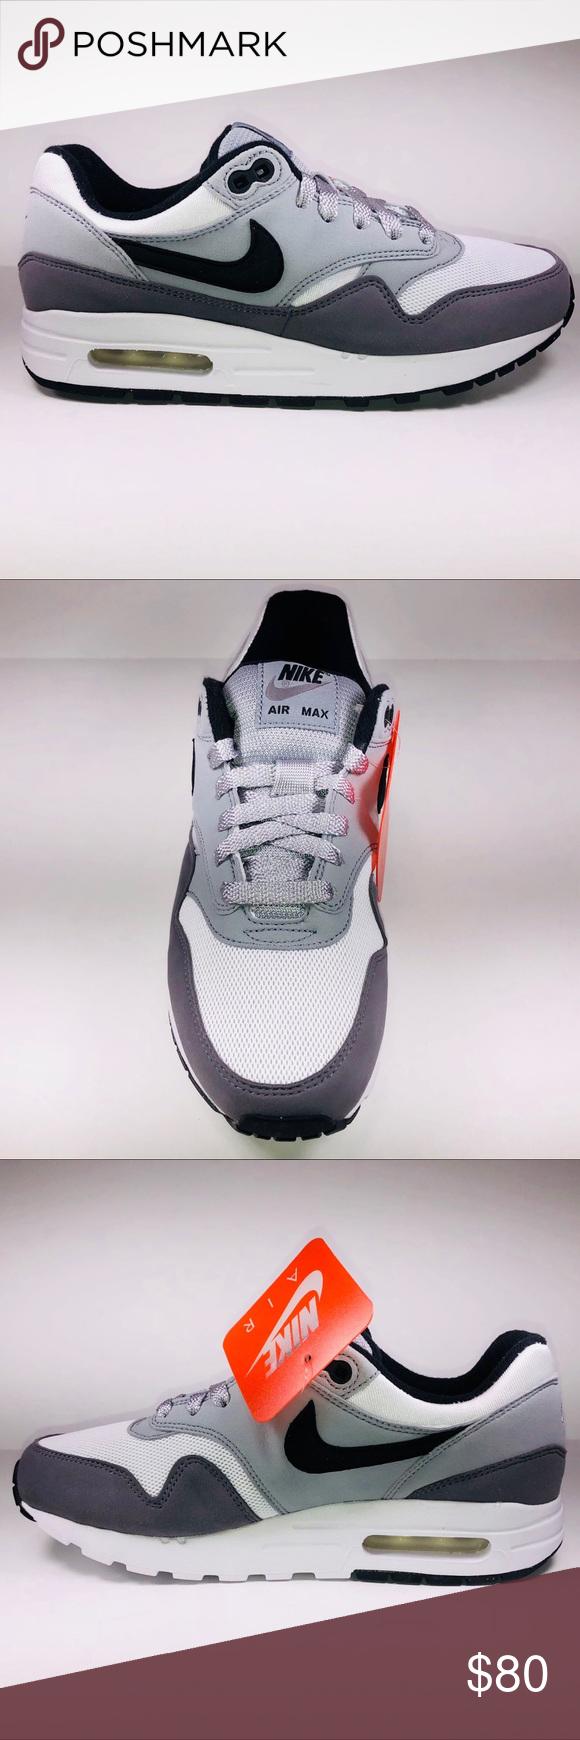 Nike Air Max 1 GS Black, Gunsmoke & White Sneakers New With